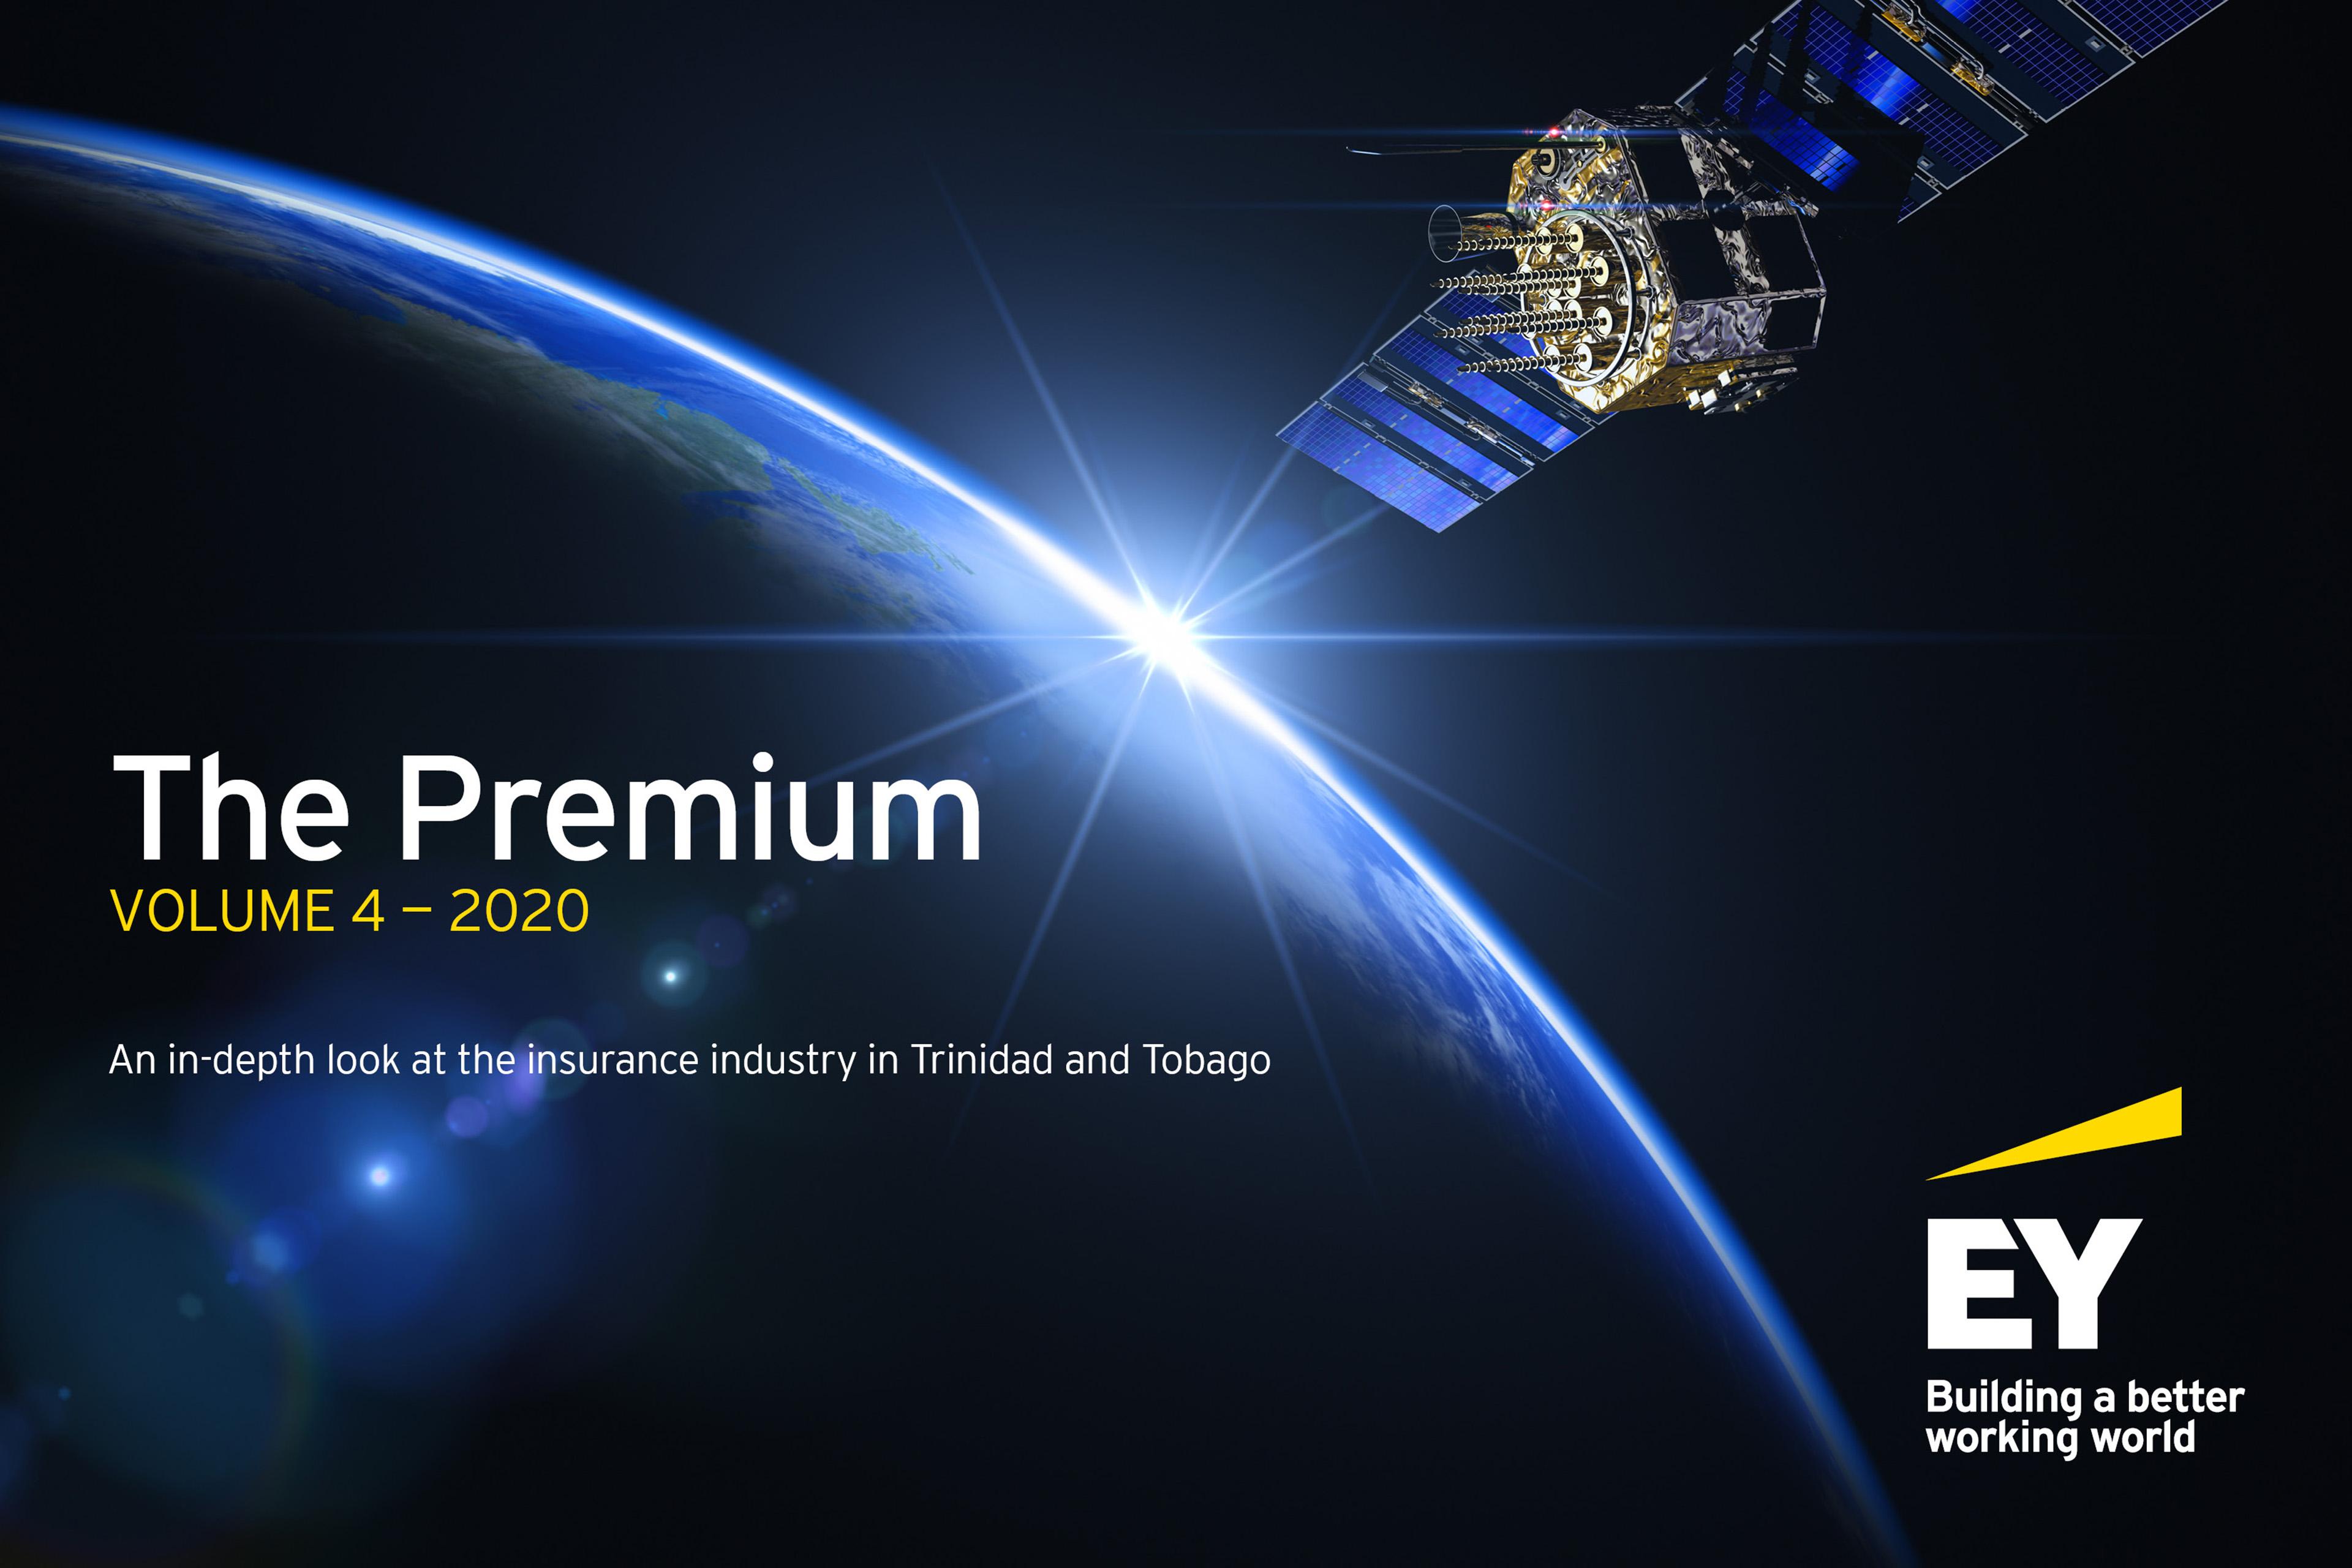 ey-tt-premium-magazine-sat-3840x2560-20201218